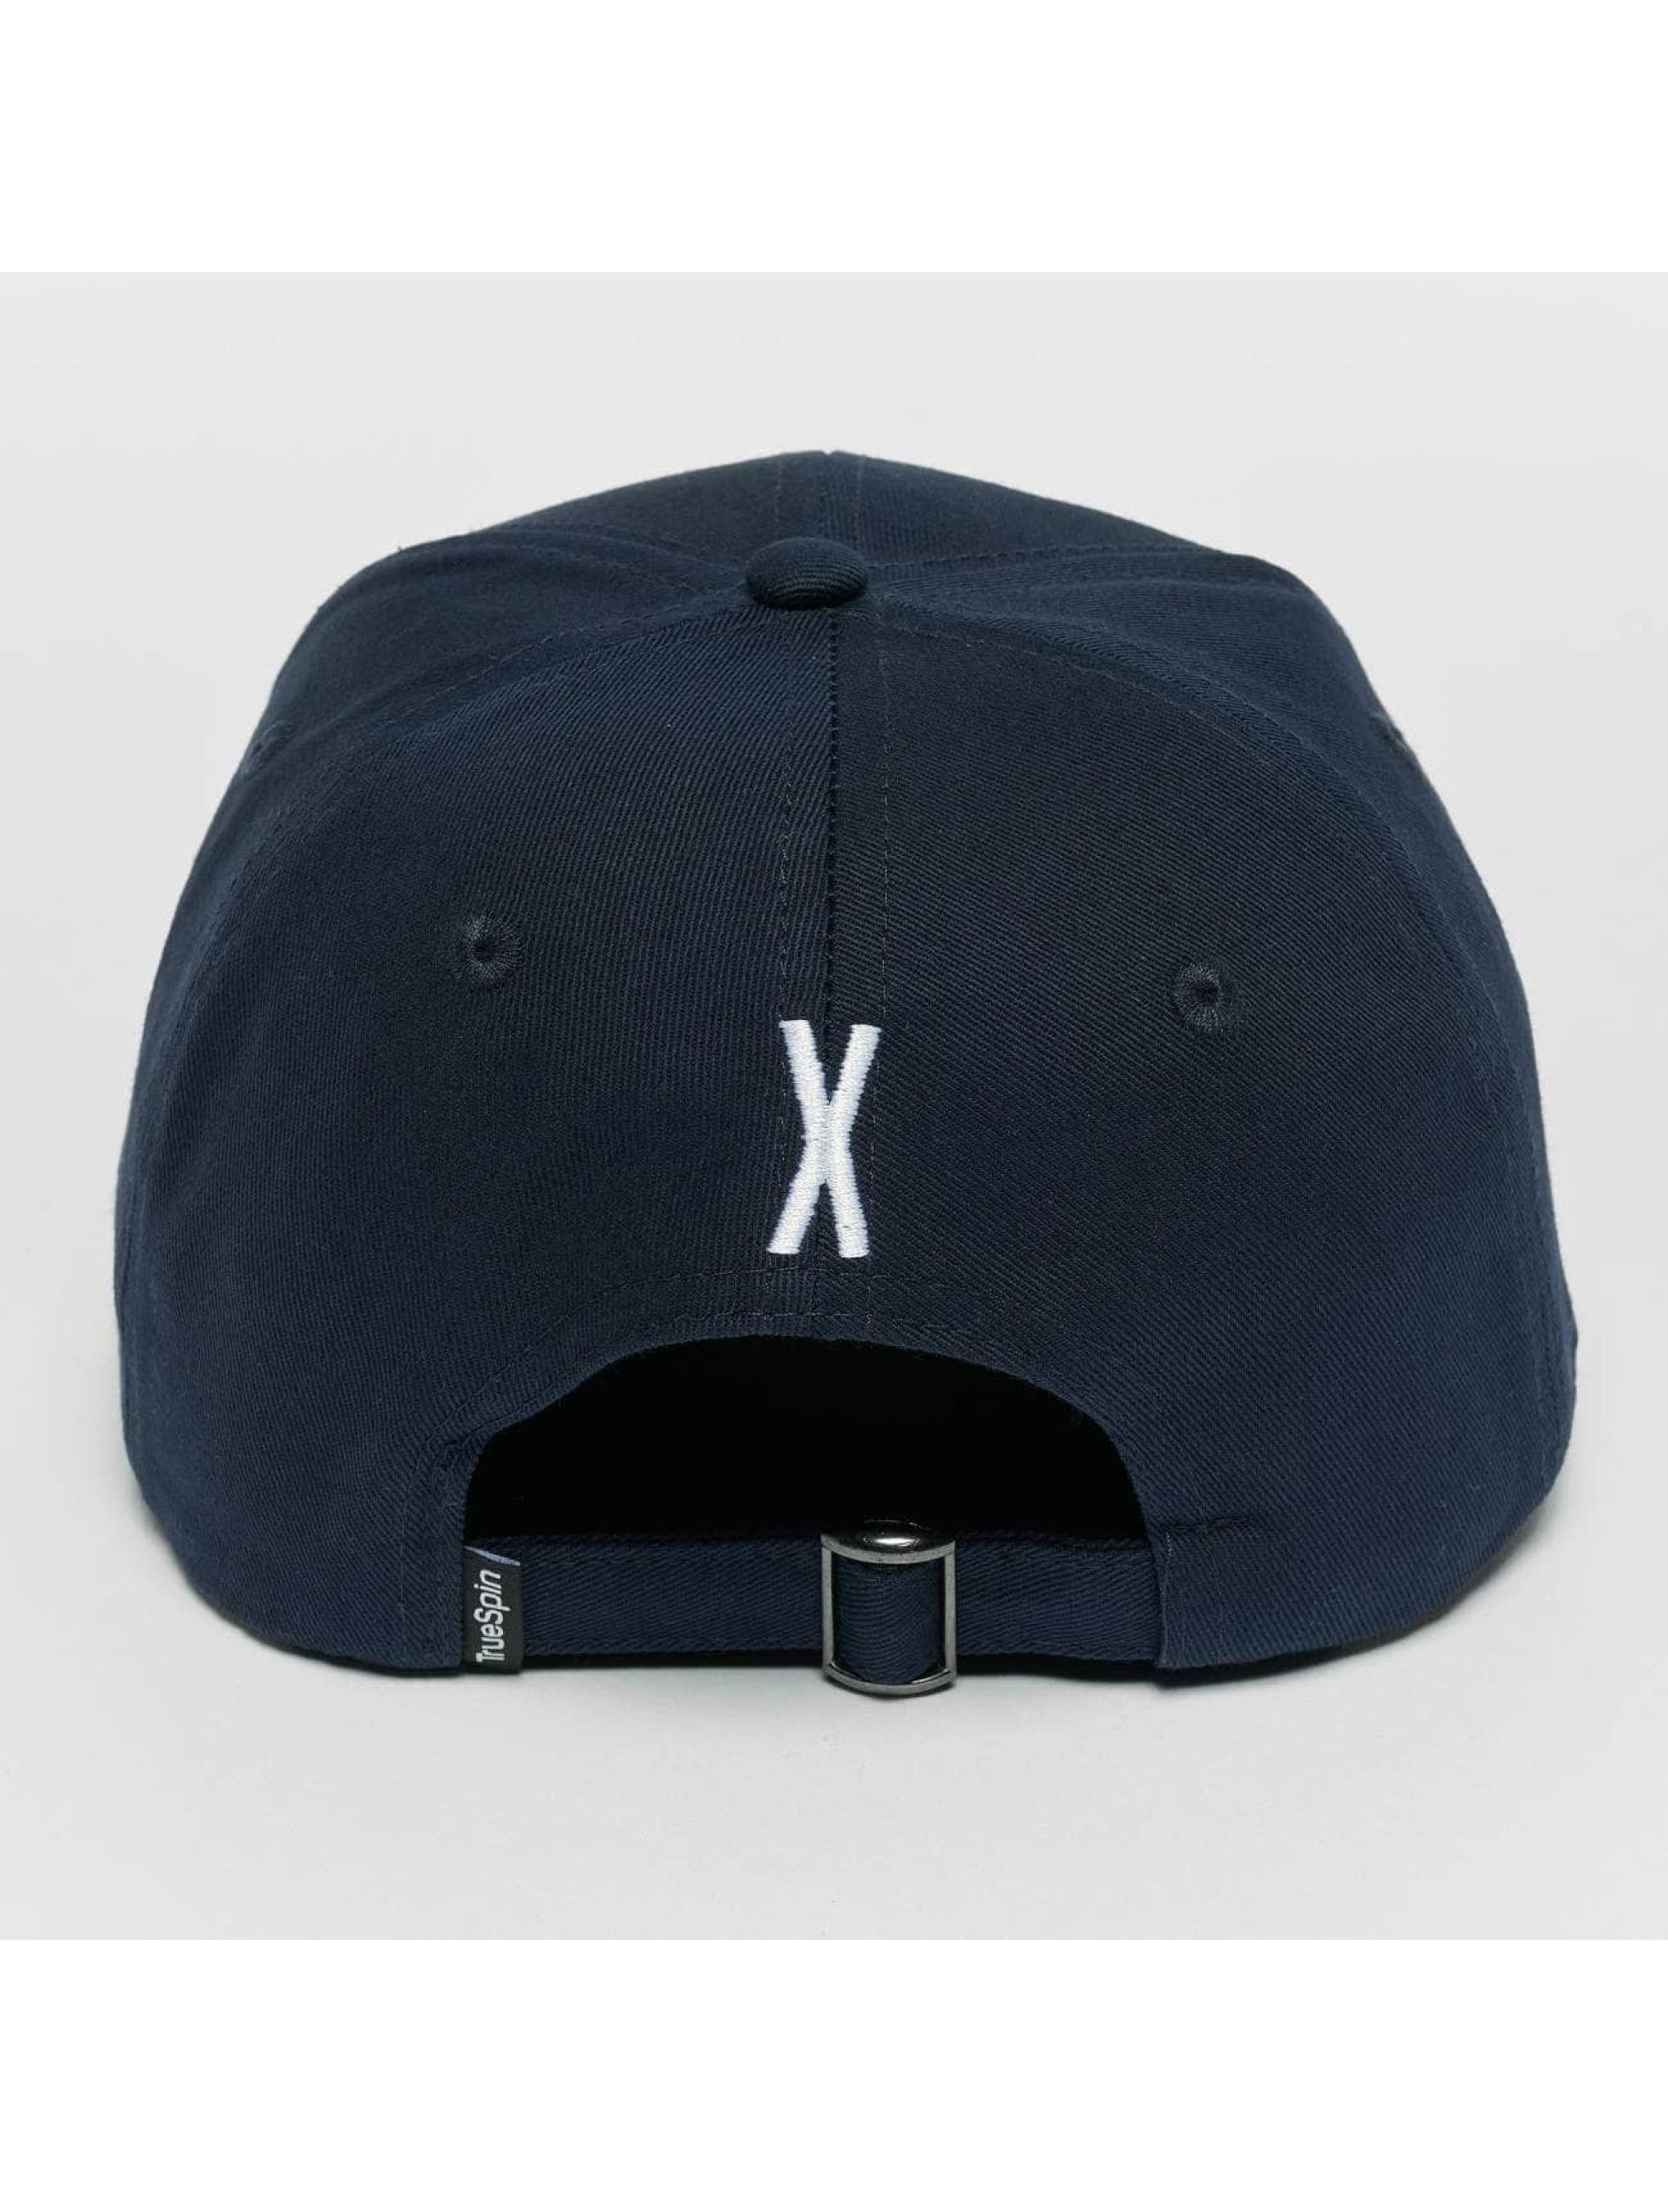 TrueSpin Casquette Snapback & Strapback ABC X bleu